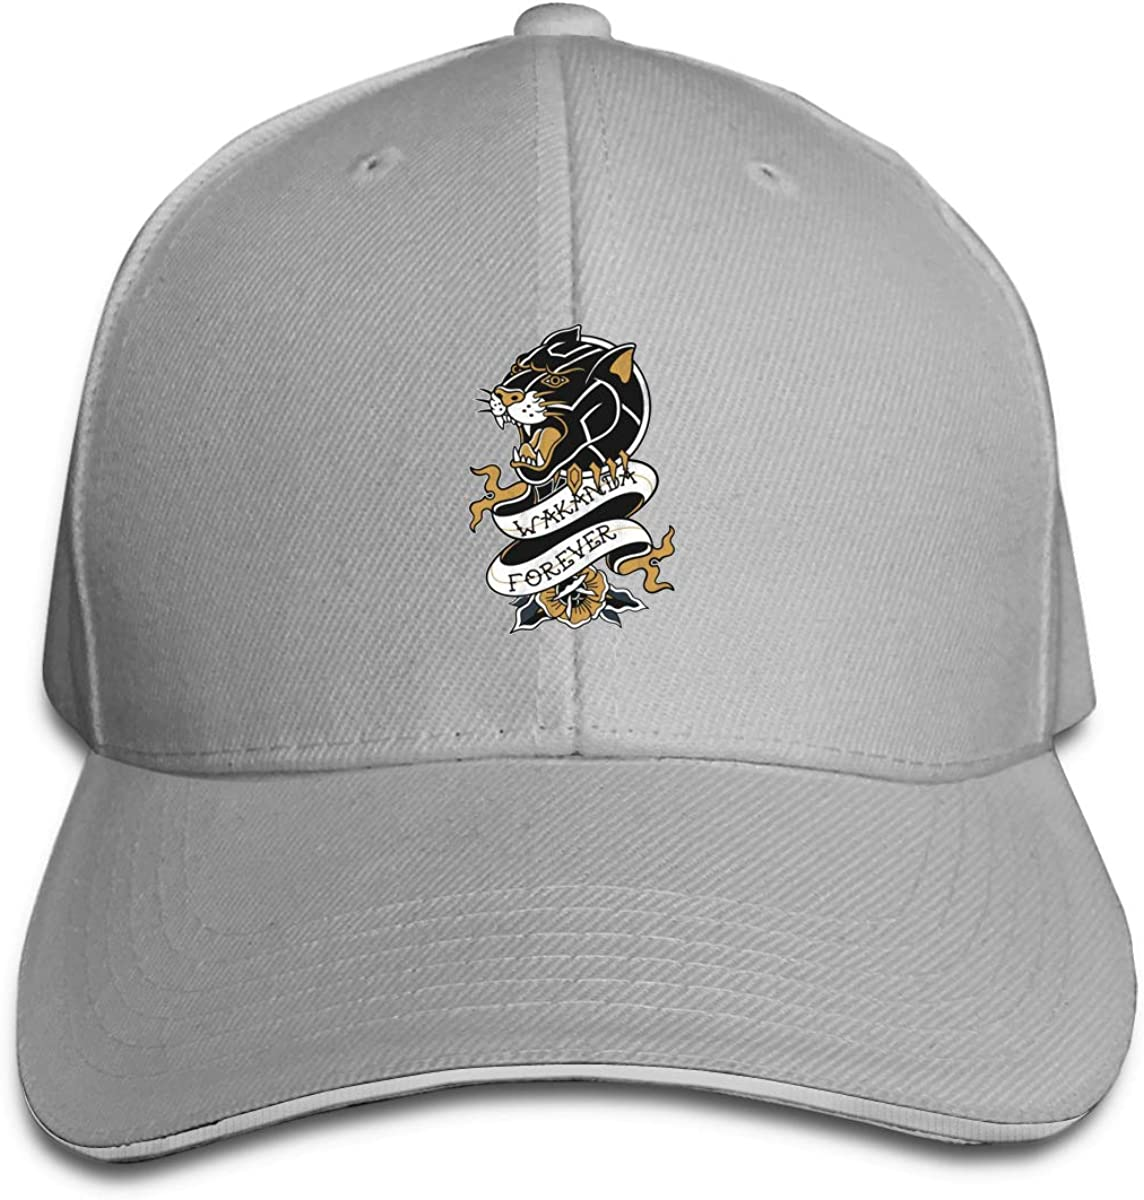 Wakanda Forever Classic Adjustable Cotton Baseball Caps Trucker Driver Hat Outdoor Cap Gray